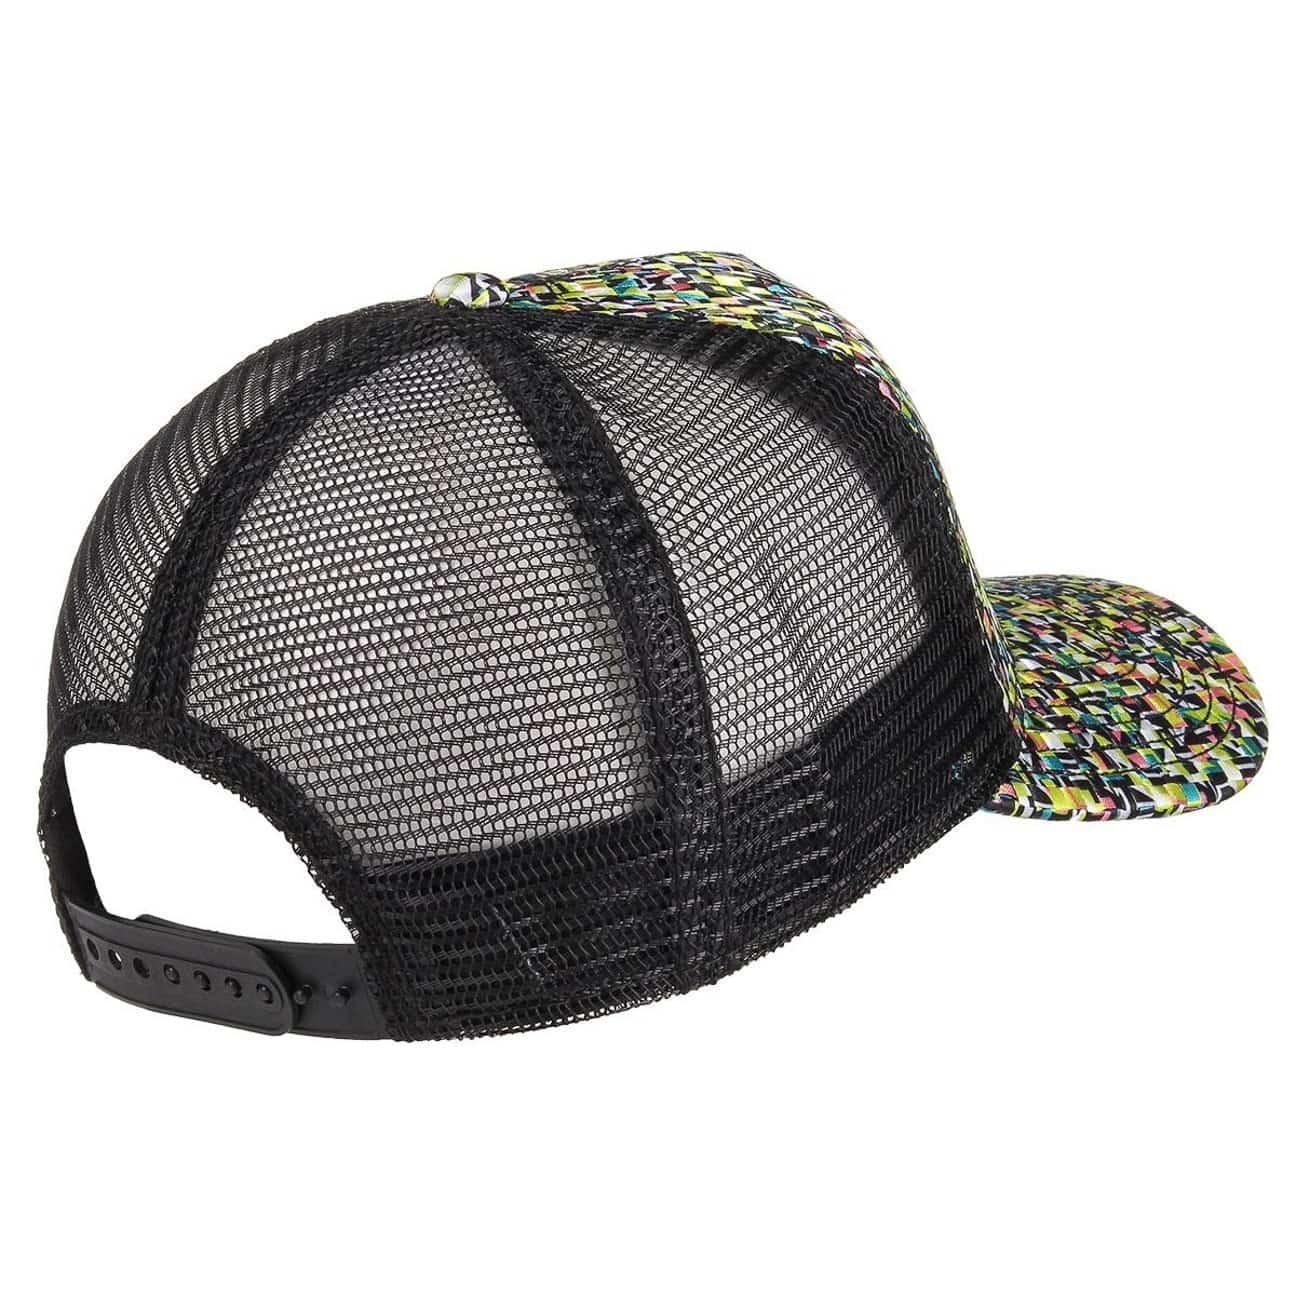 hft shifted trucker cap by djinns gbp 18 95 hats. Black Bedroom Furniture Sets. Home Design Ideas